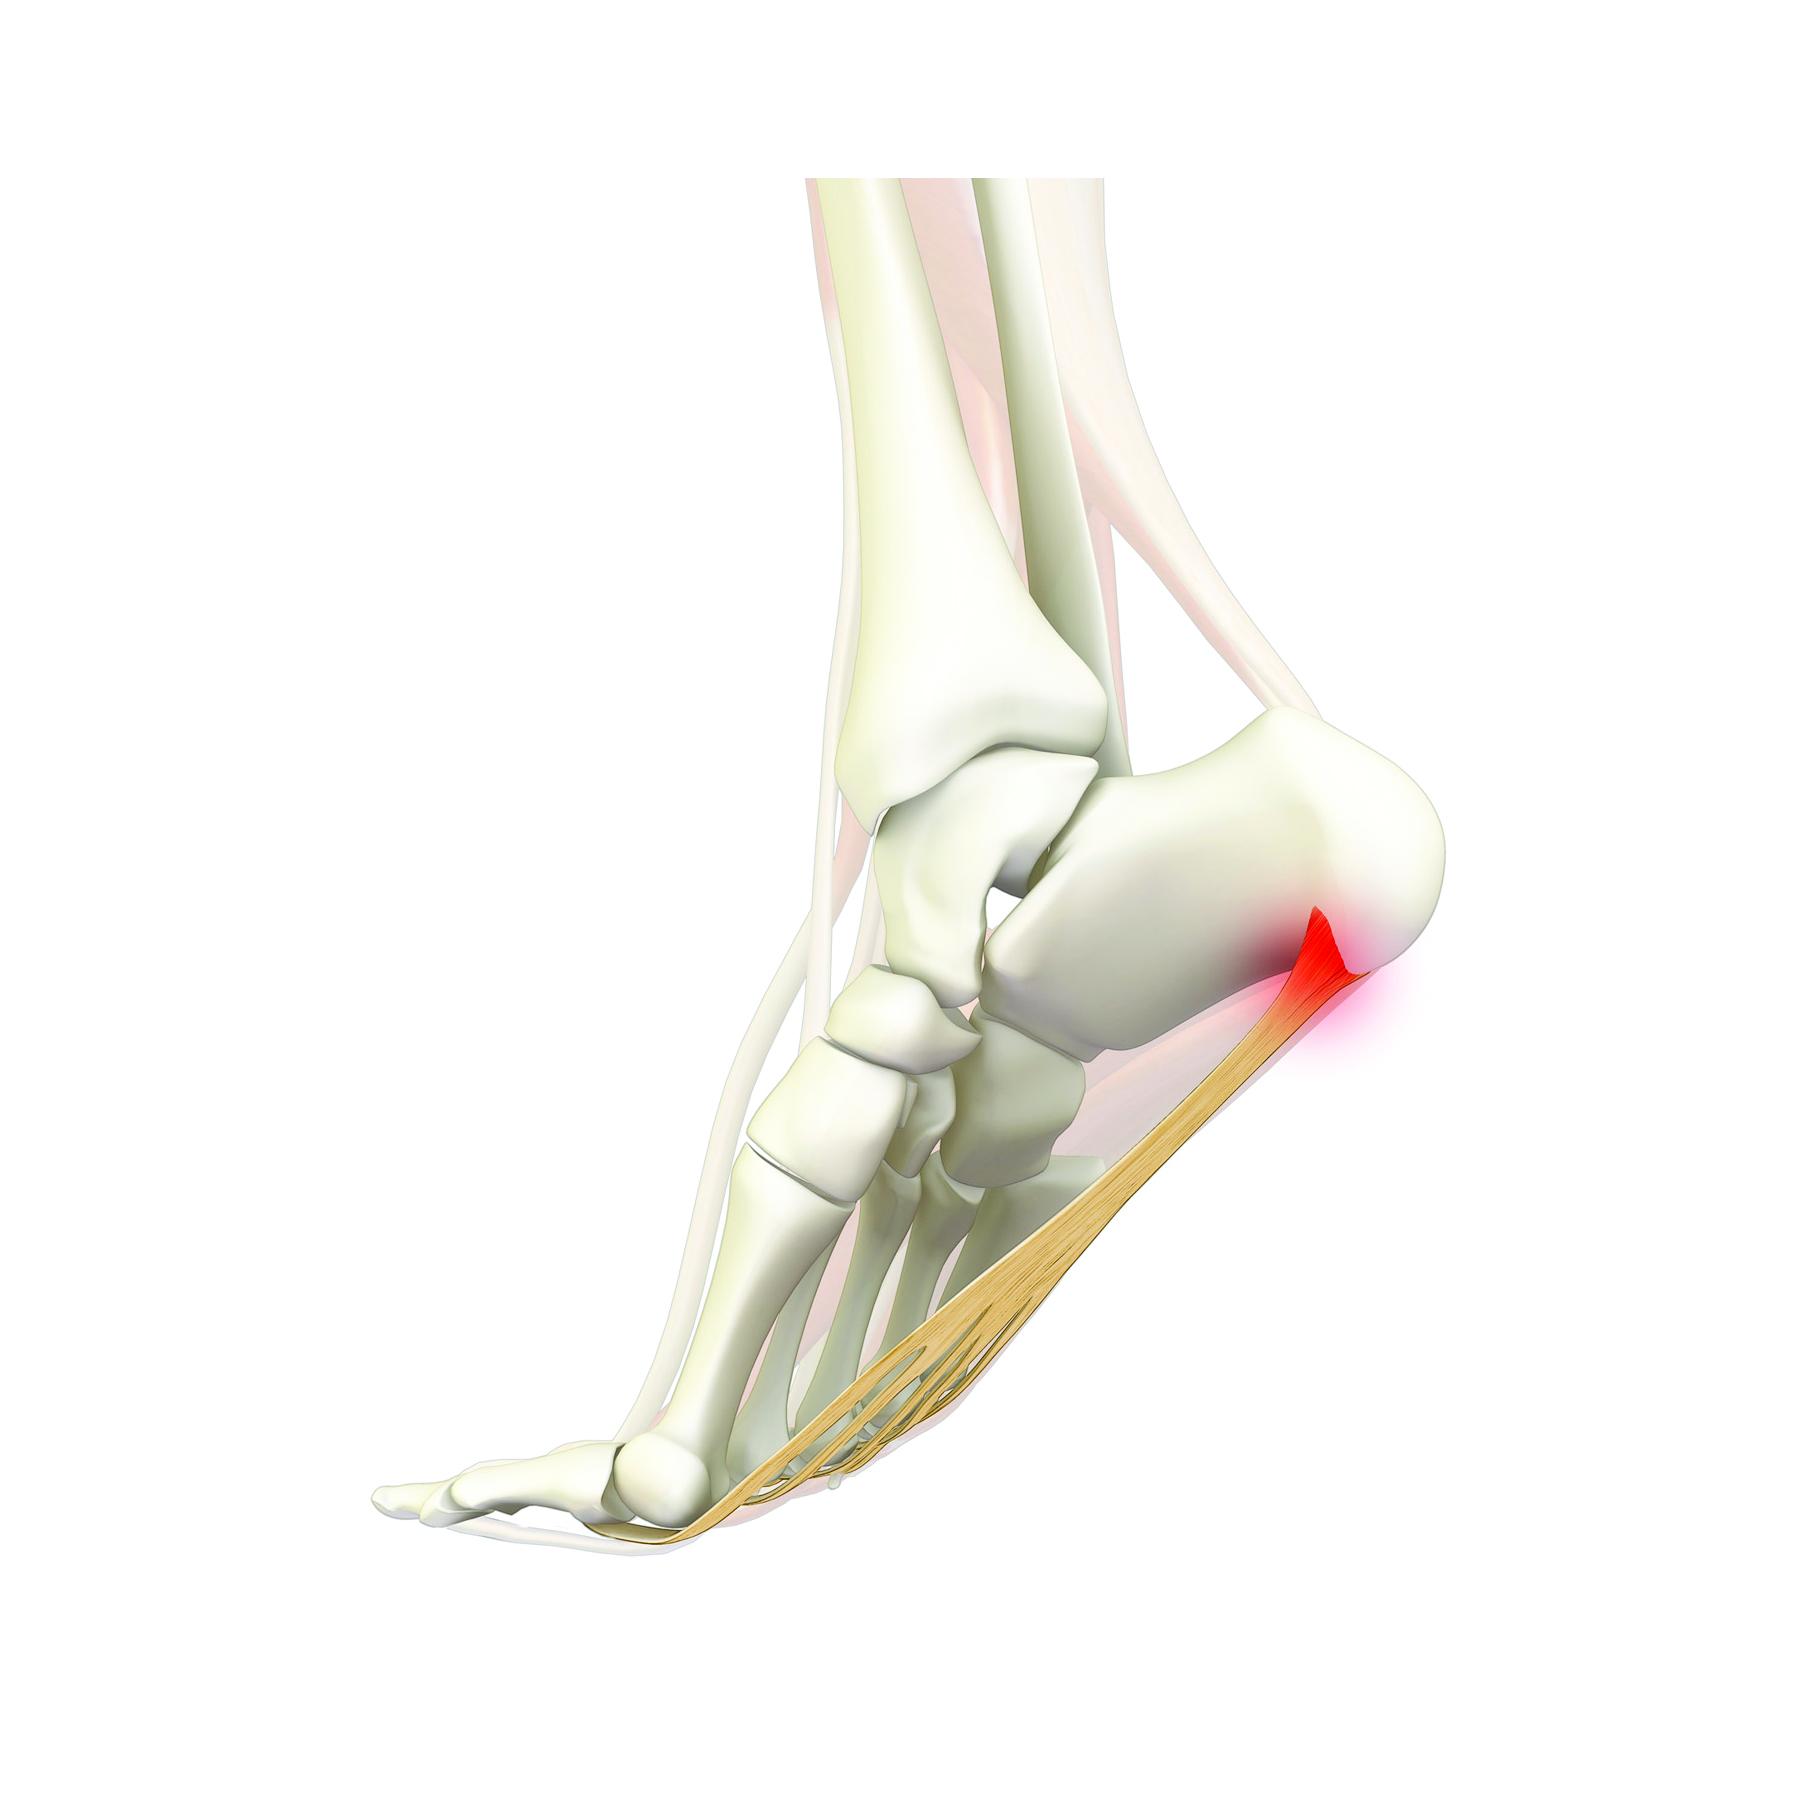 anatomy-structure-foot-heel-pain